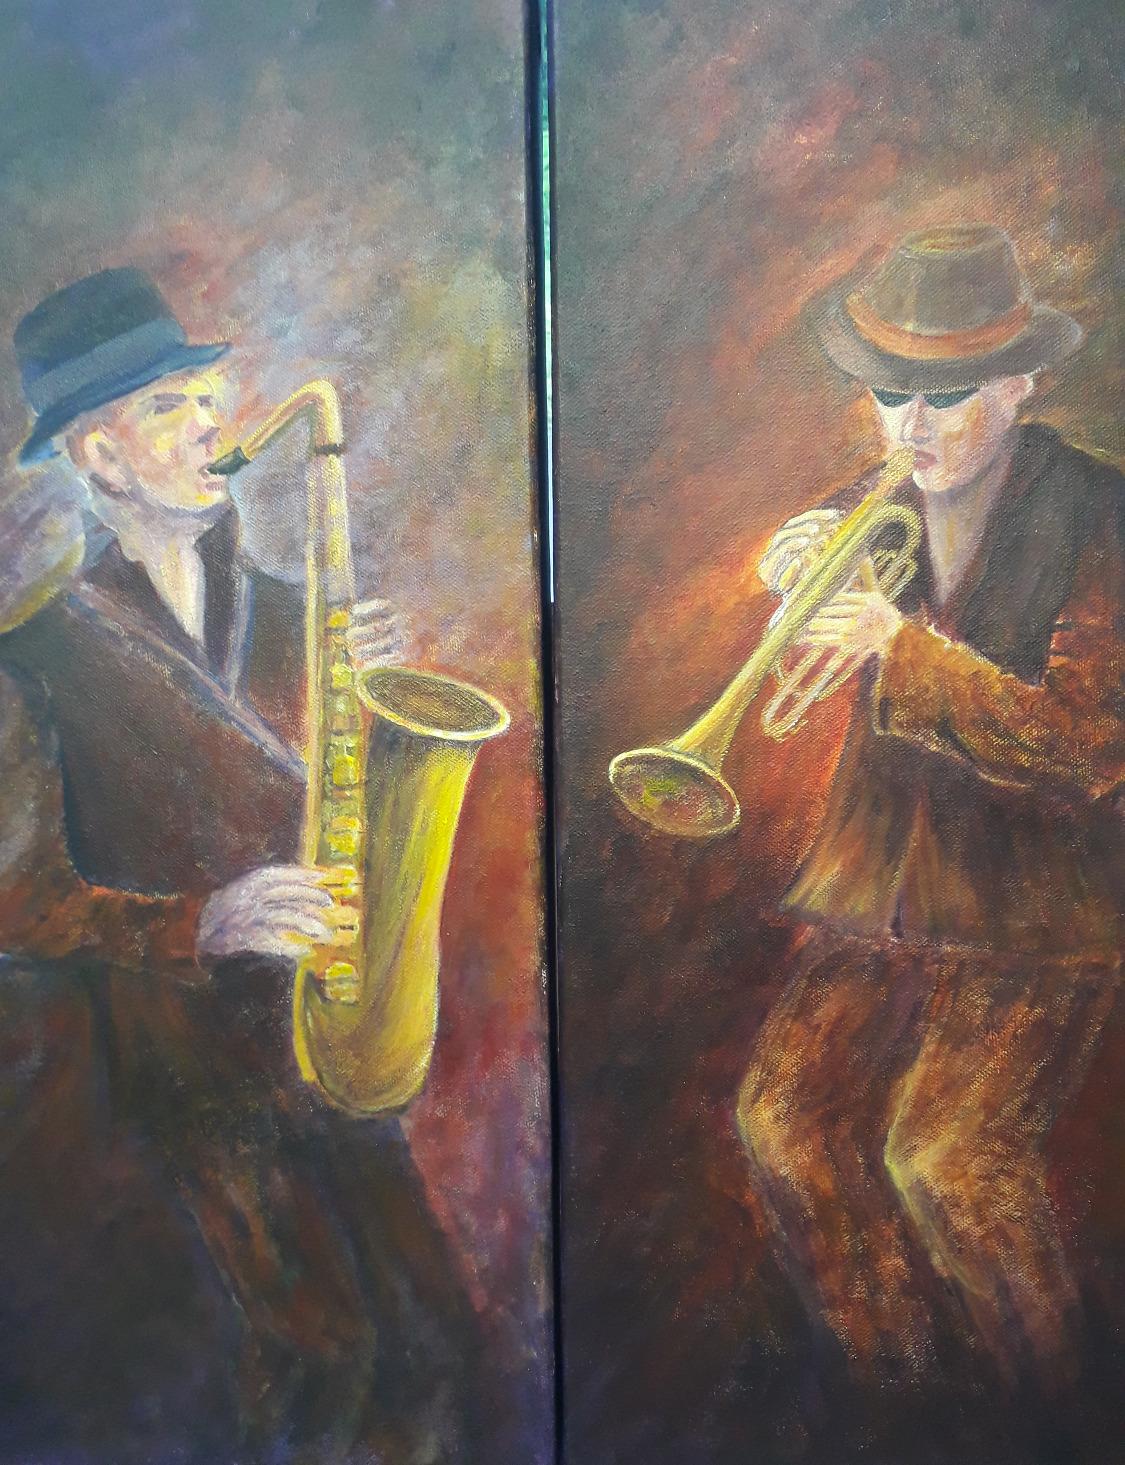 Moody blues 1 and II